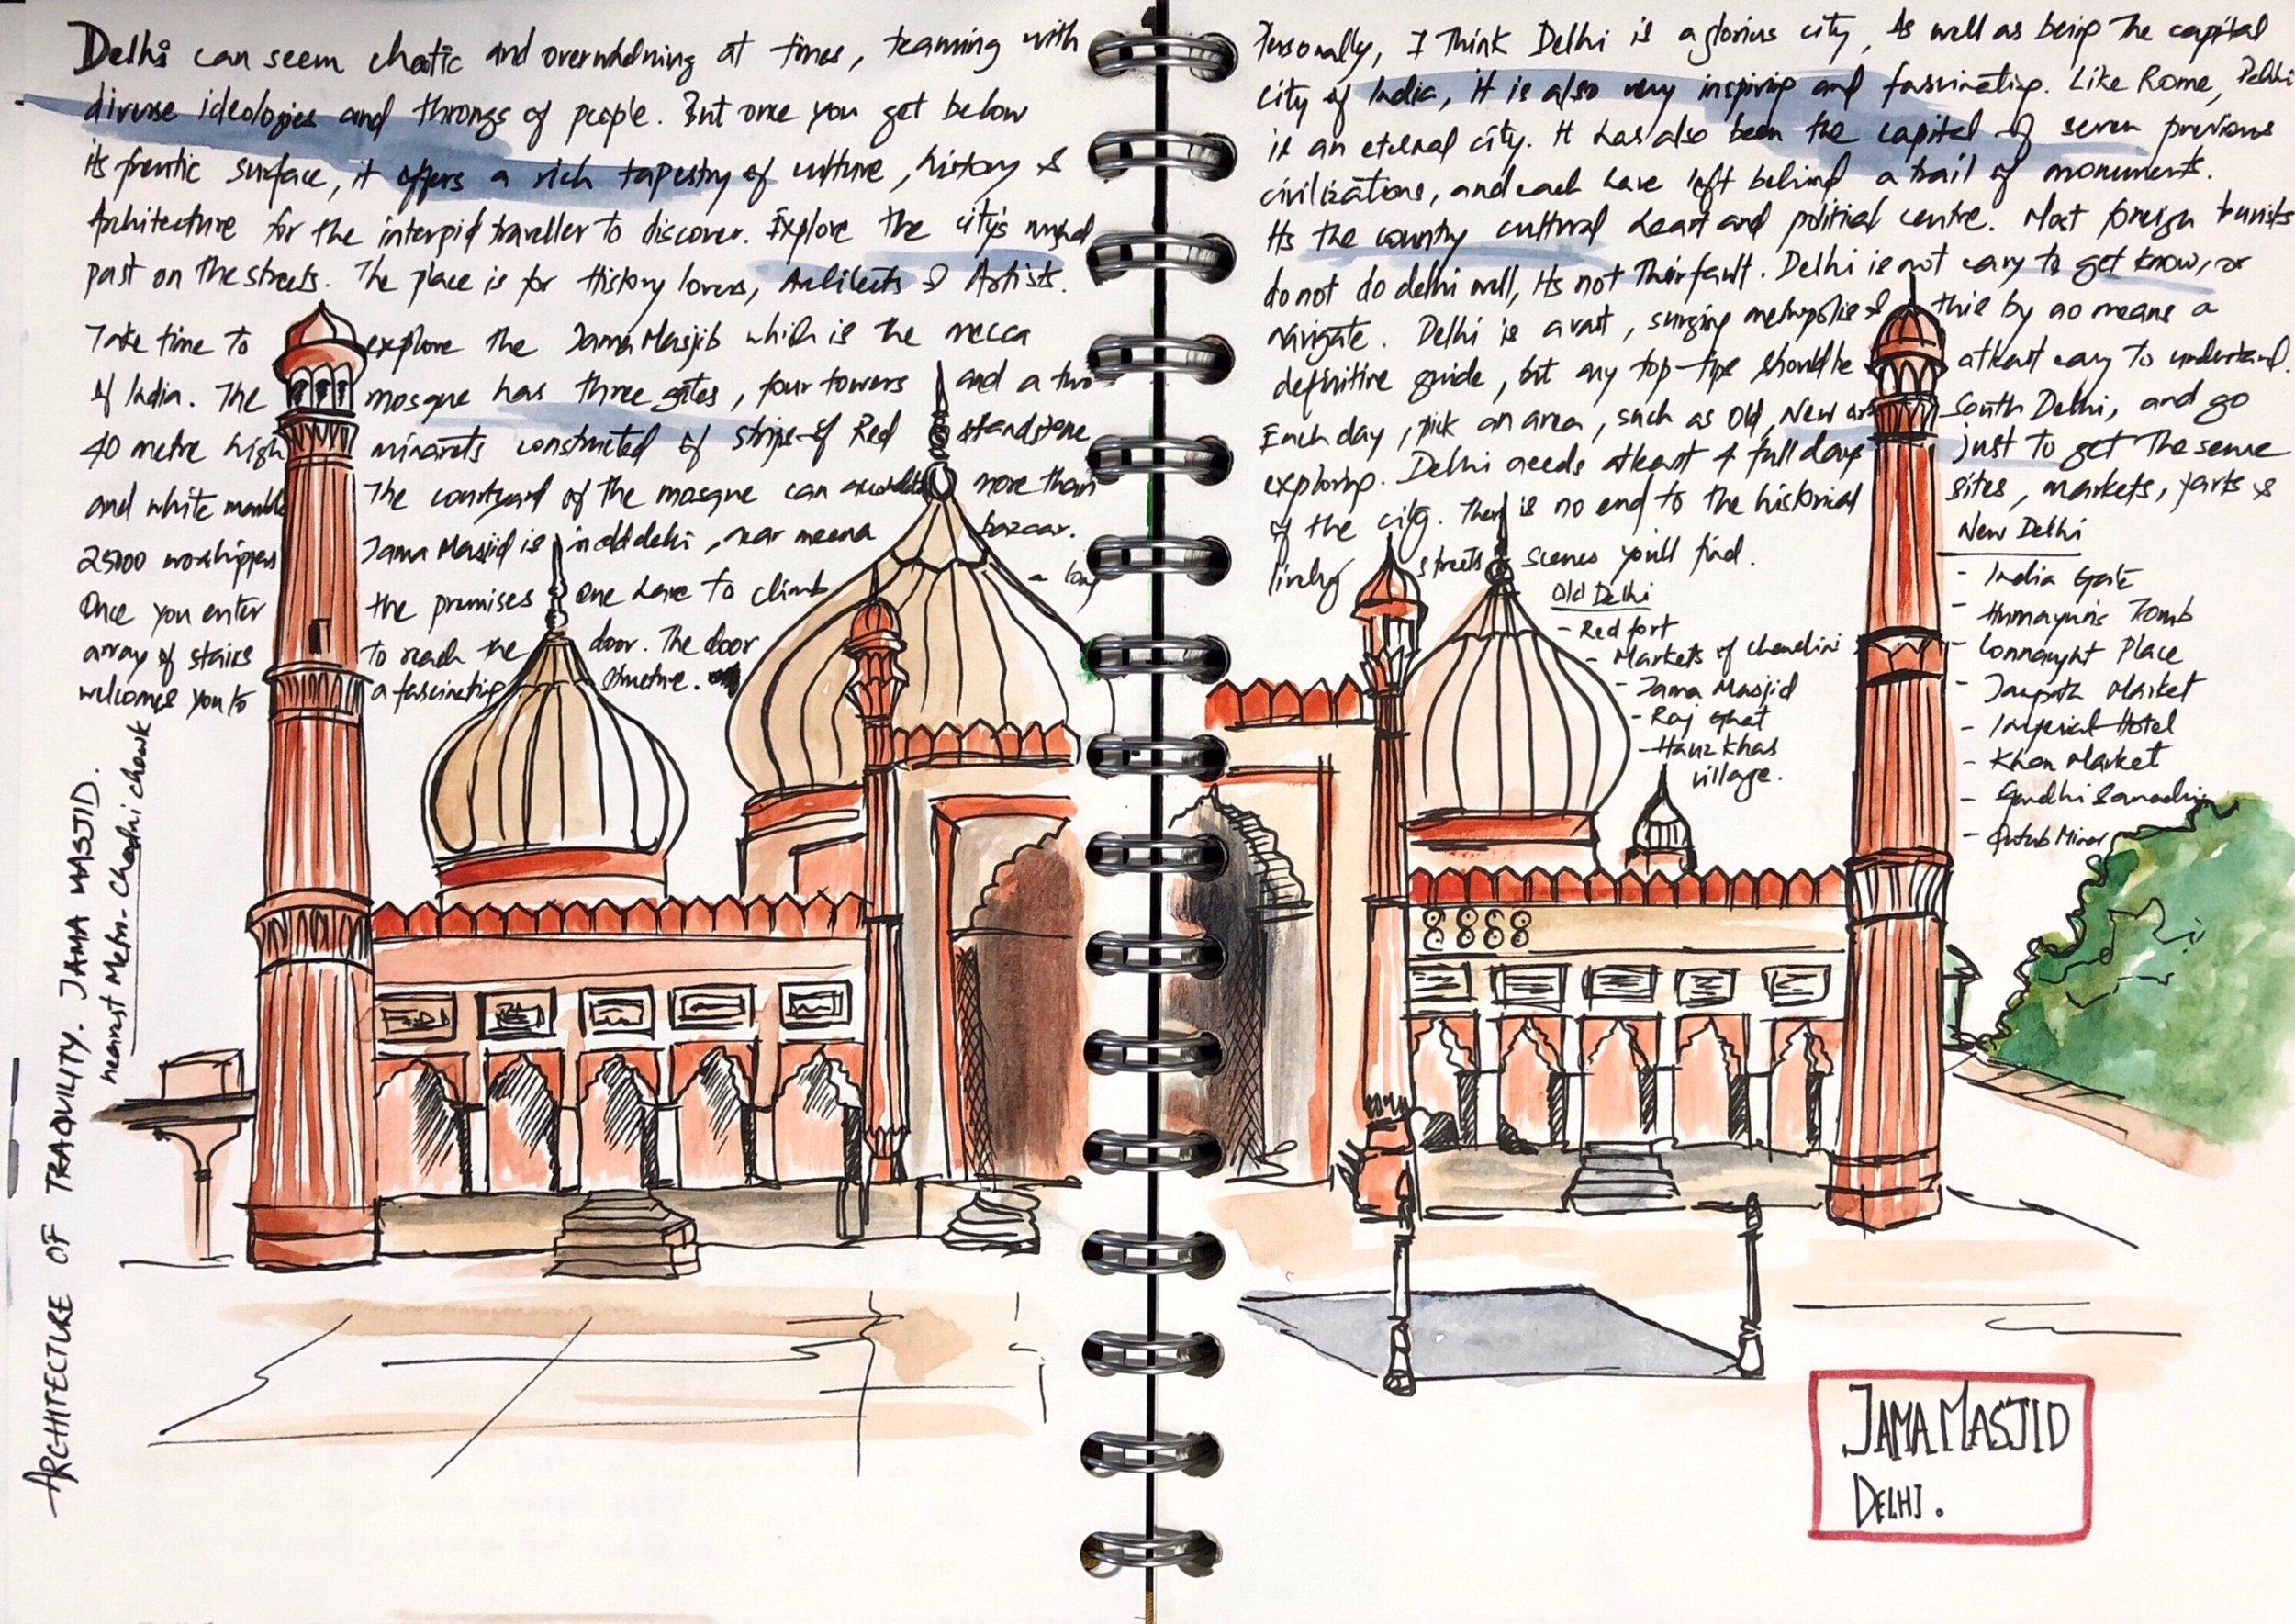 Jama-masjid-front-delhi.jpg